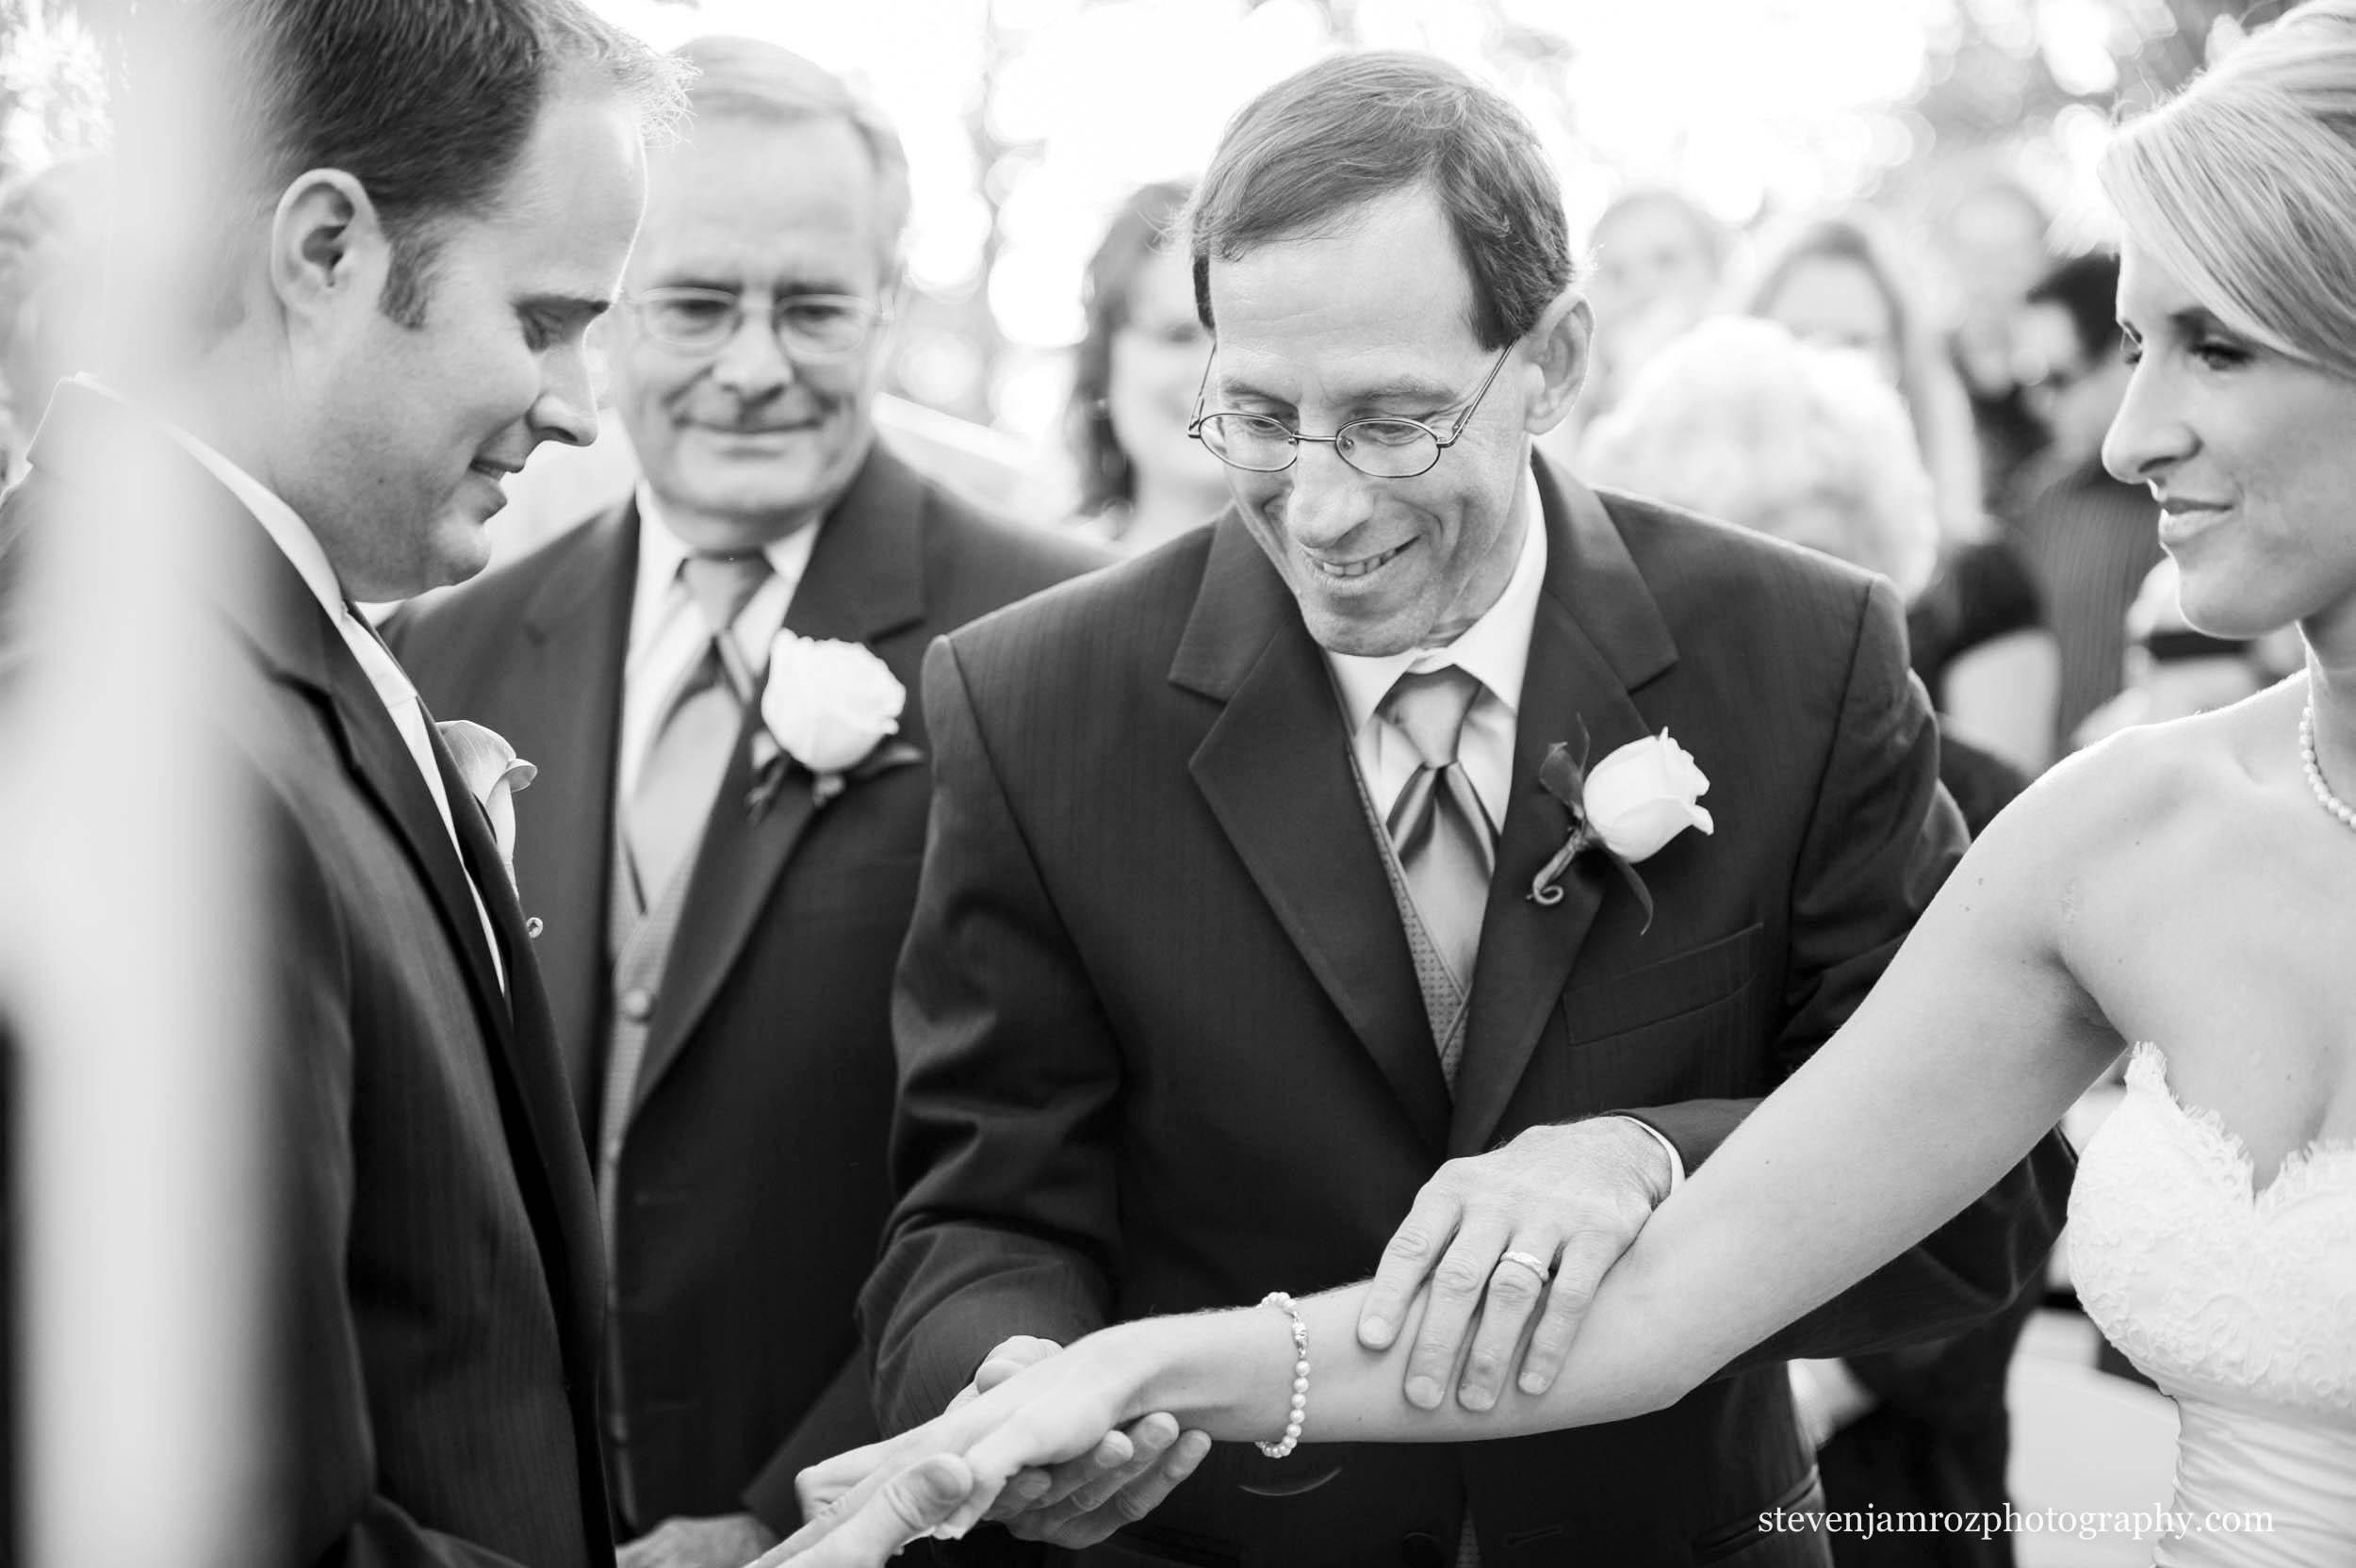 father-hands-off-bride-raleigh-wedding-steven-jamroz-photography-0097.jpg